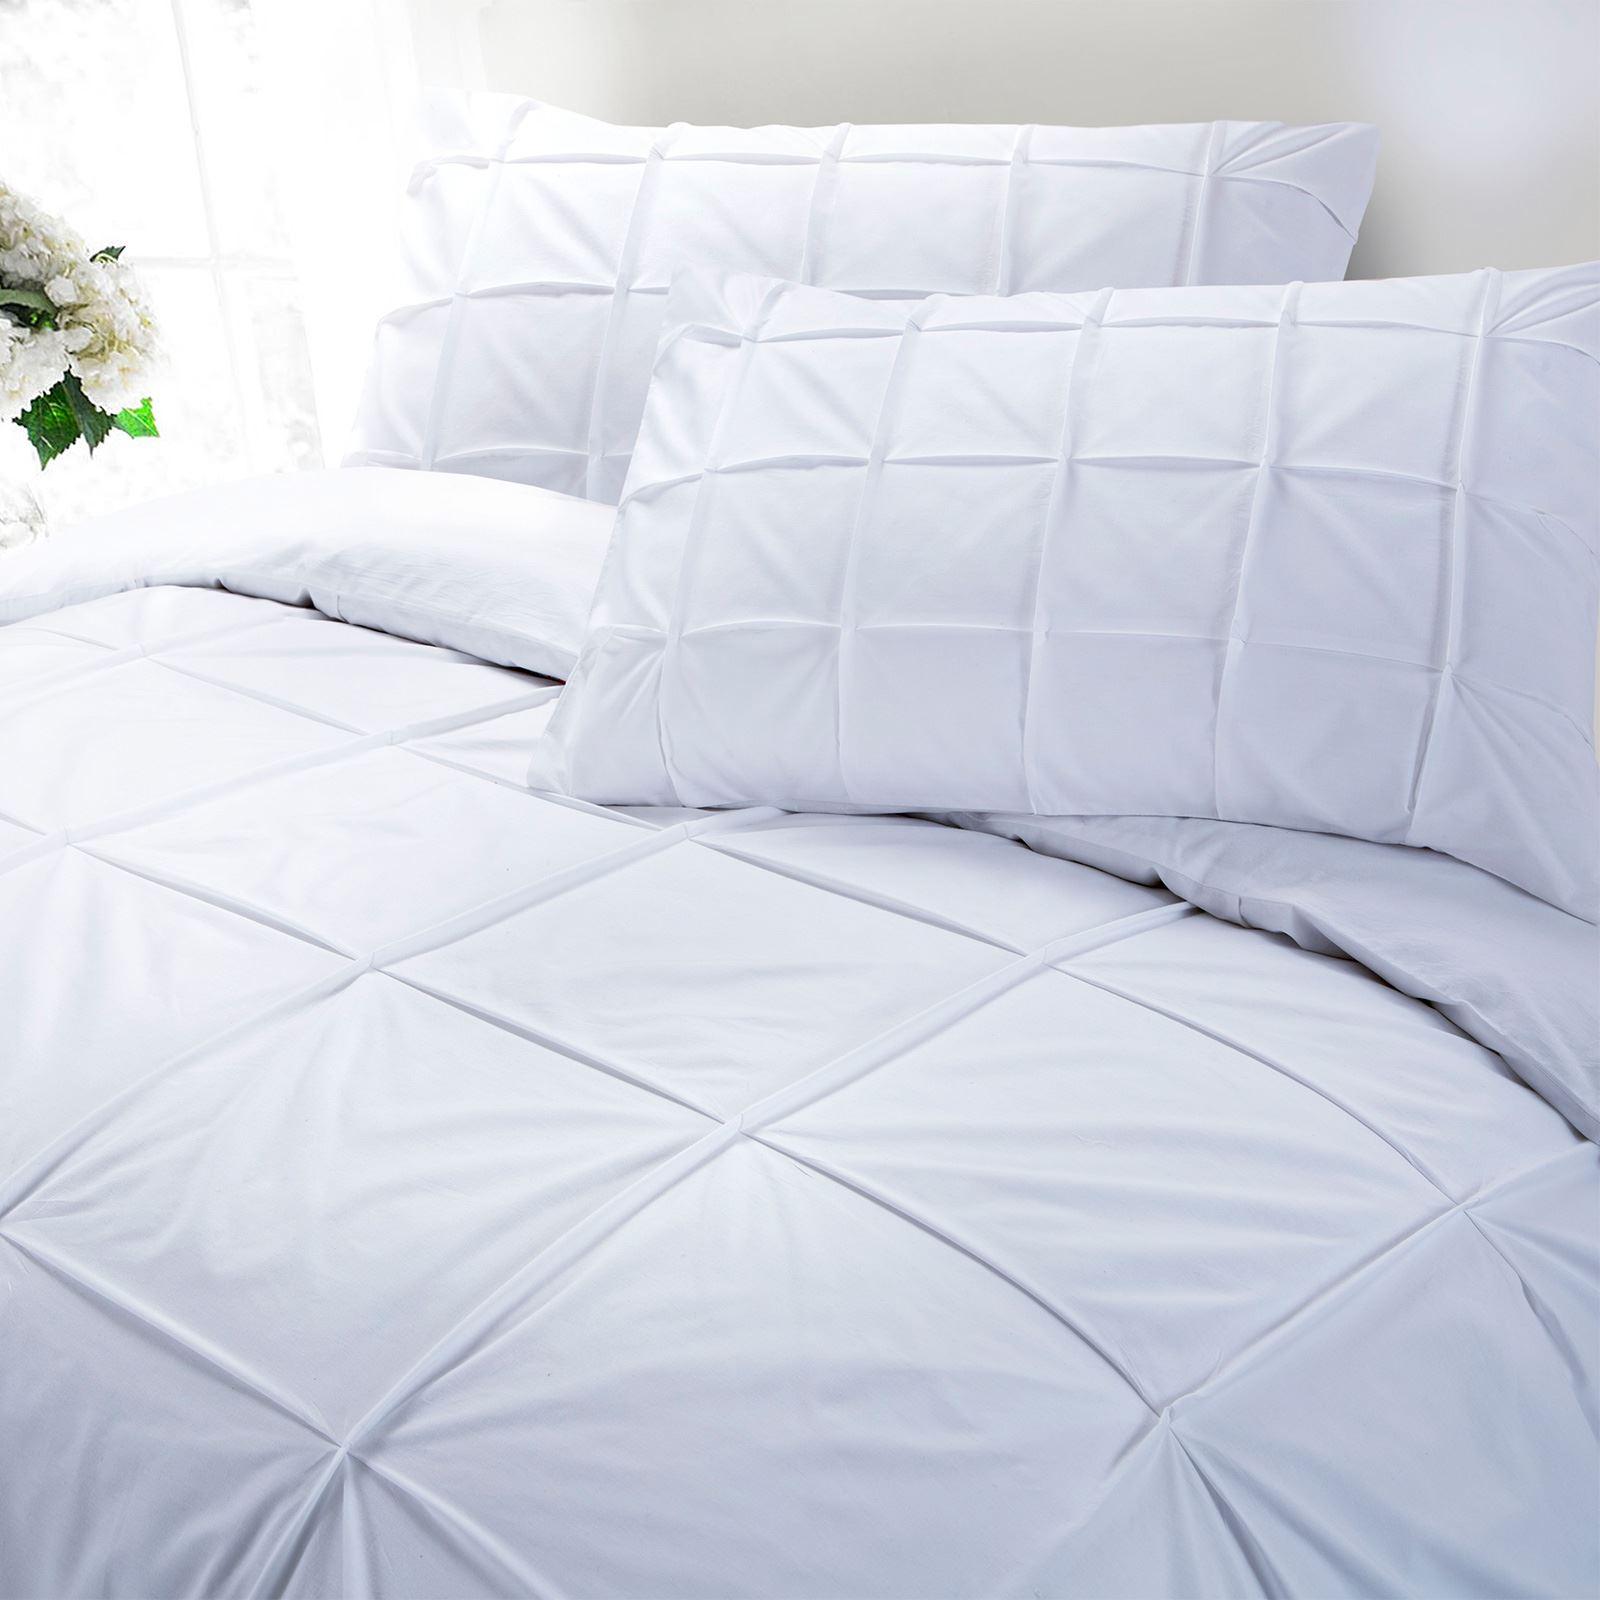 100-Algodon-Egipcio-Cubierta-Del-Edredon-Edredon-Juego-Individual-Doble-King-Size-Bed-Sabanas miniatura 3